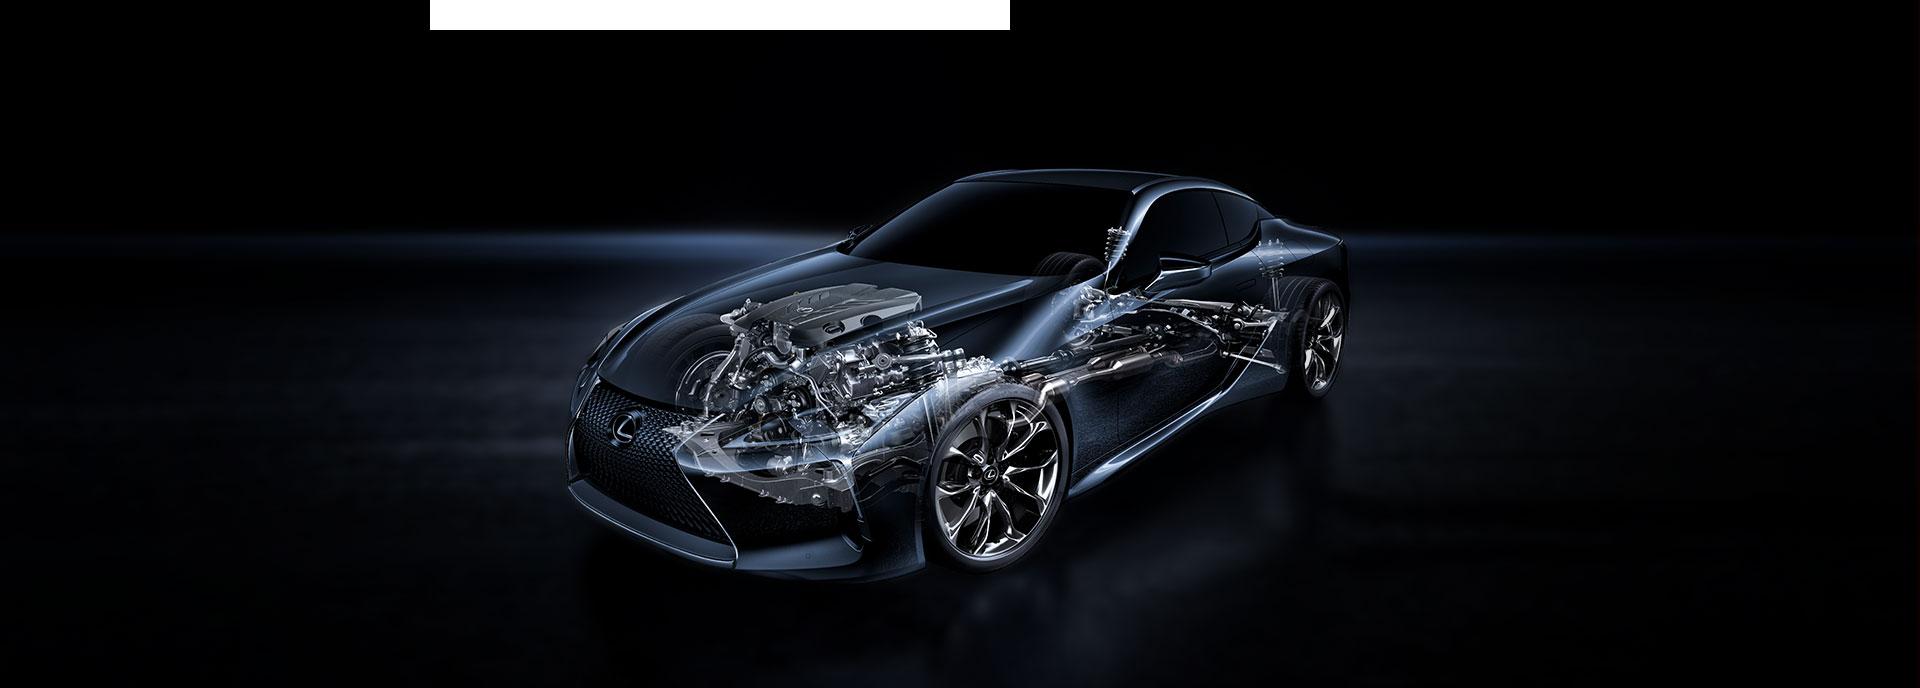 2017 Lexus LC Innovative Materials 500